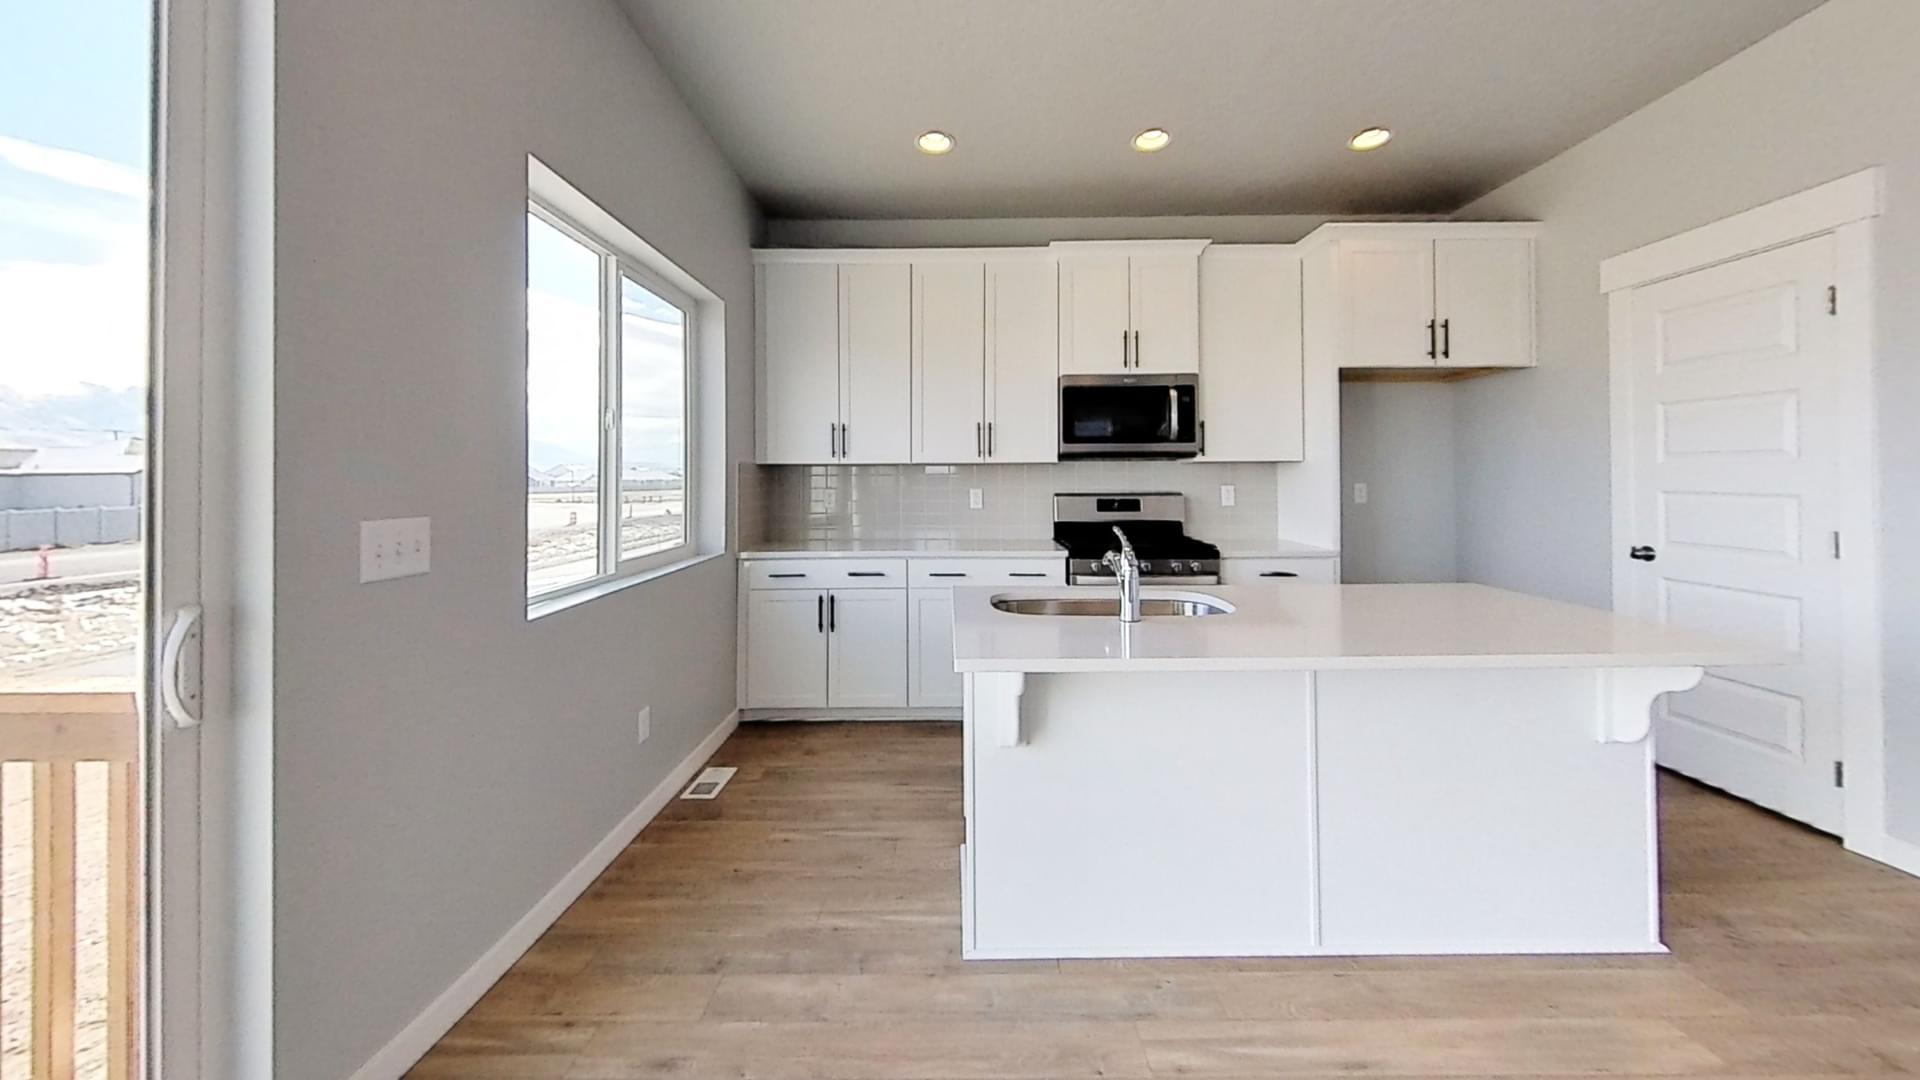 The Bridger new home floorplan in Utah